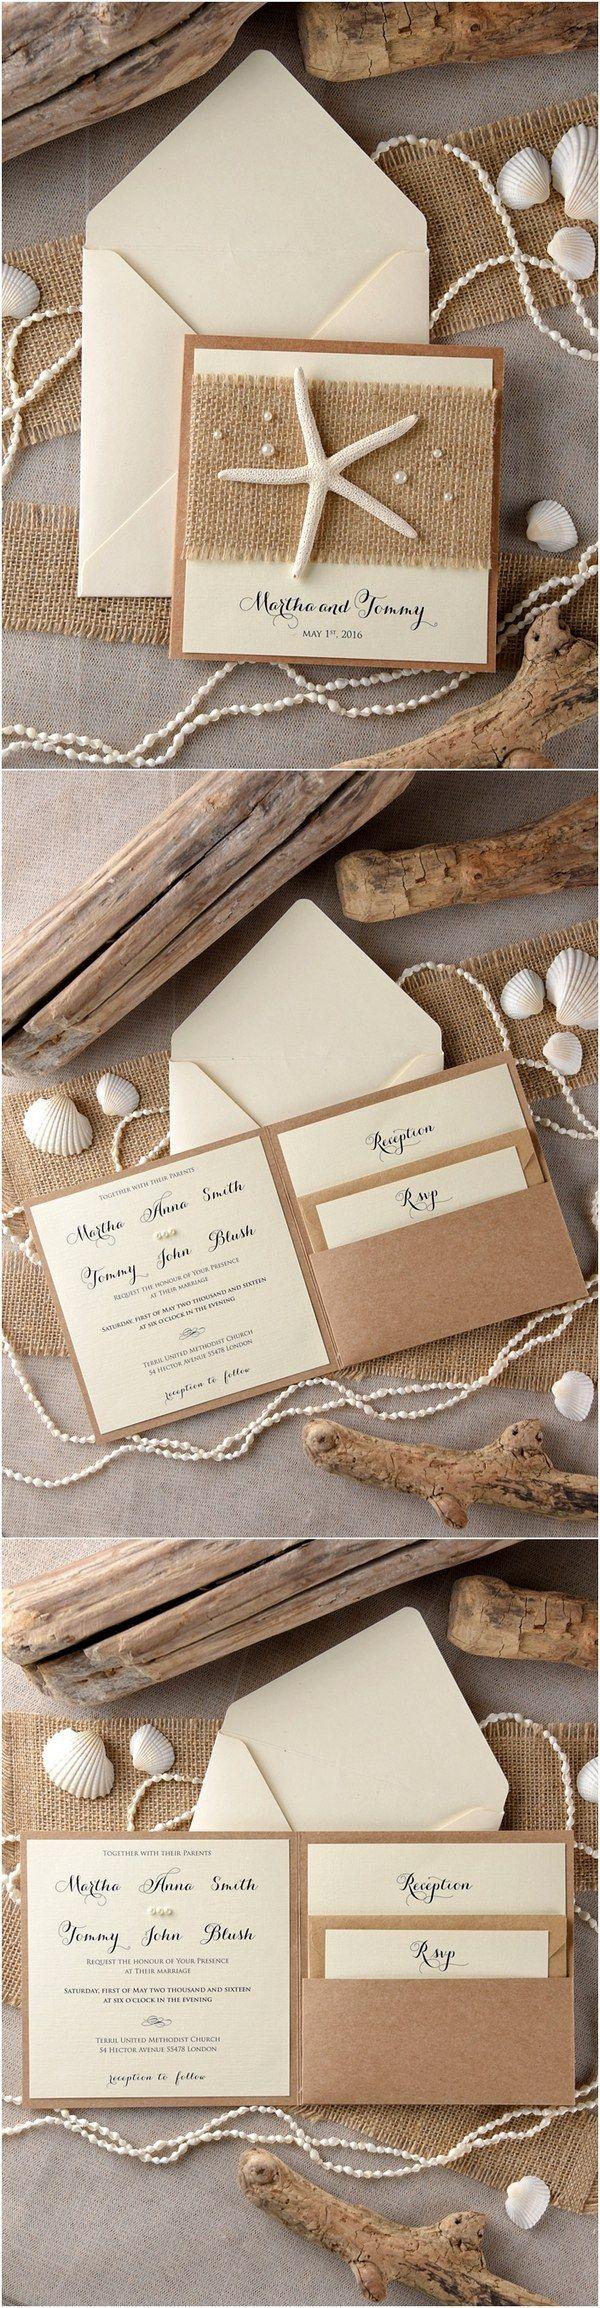 Rustic Country Burlap Wedding Invitations 4lovepolkadots Wedding